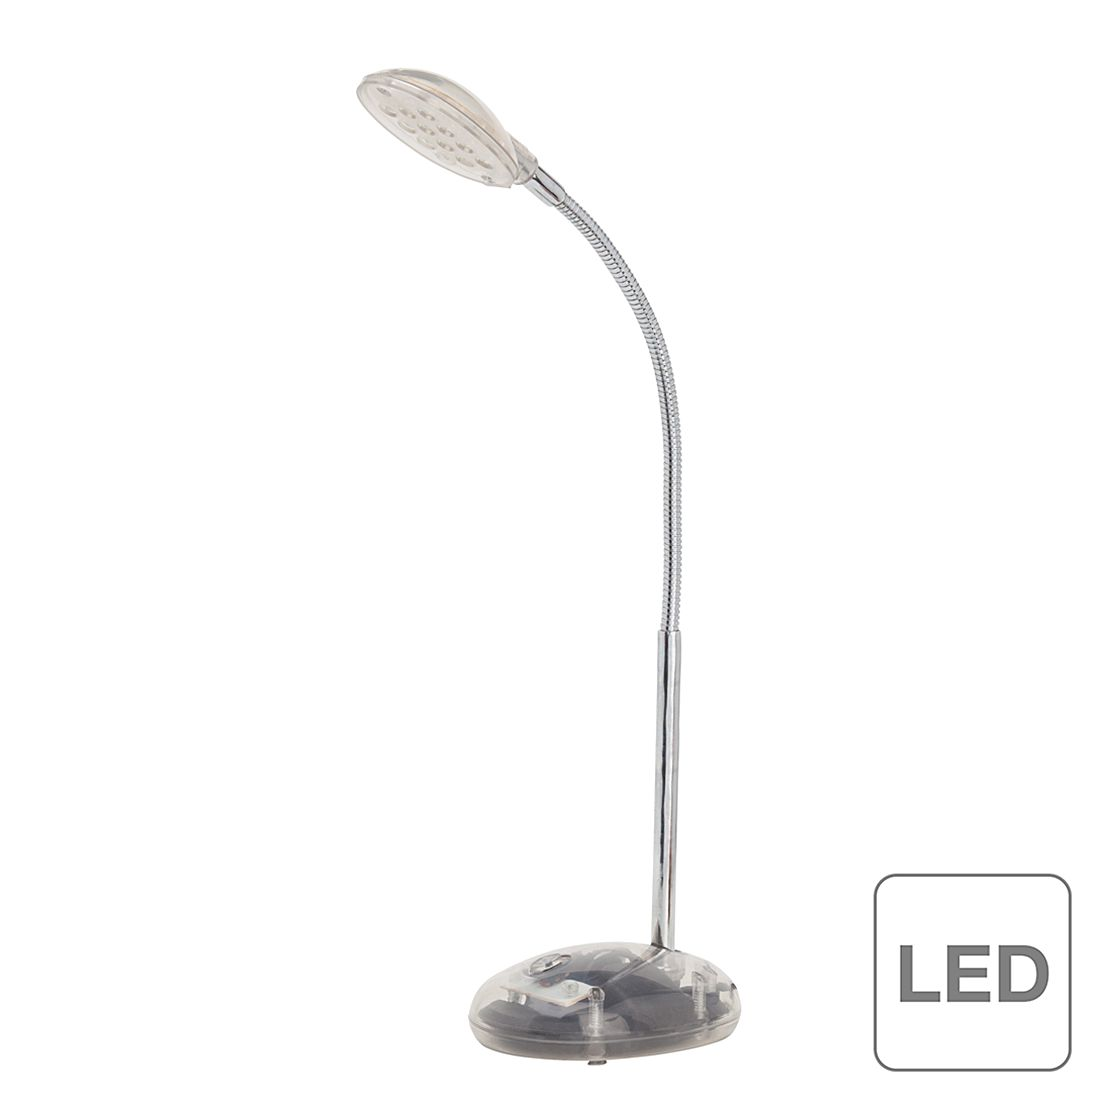 LED-Tischleuchte Timmi ● Metall / Kunststoff ● 1-flammig ● Transparent- Brilliant A+